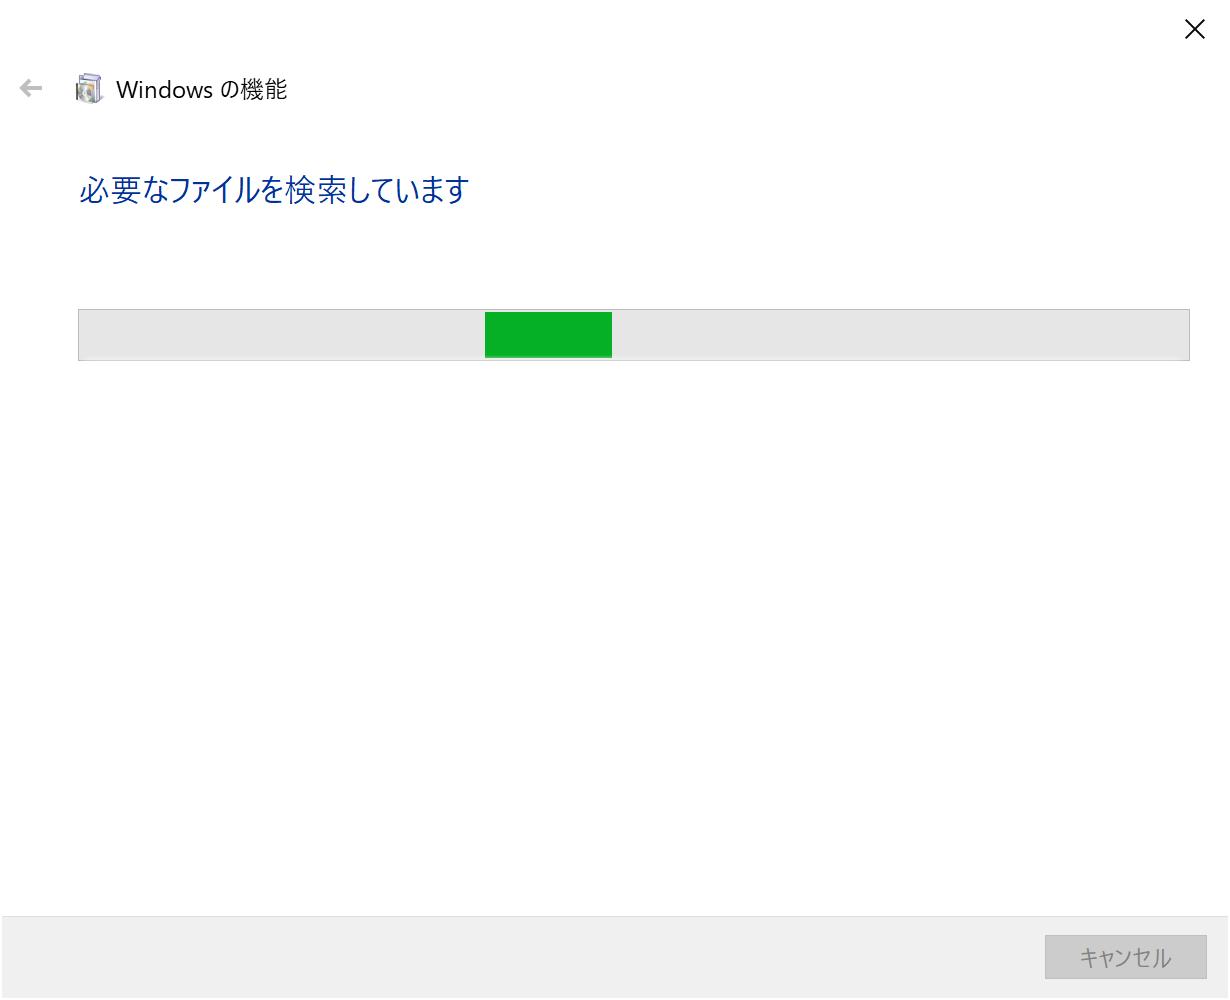 Windows 10の機能の有効化後に表示される「必要なファイルを検索しています」画面